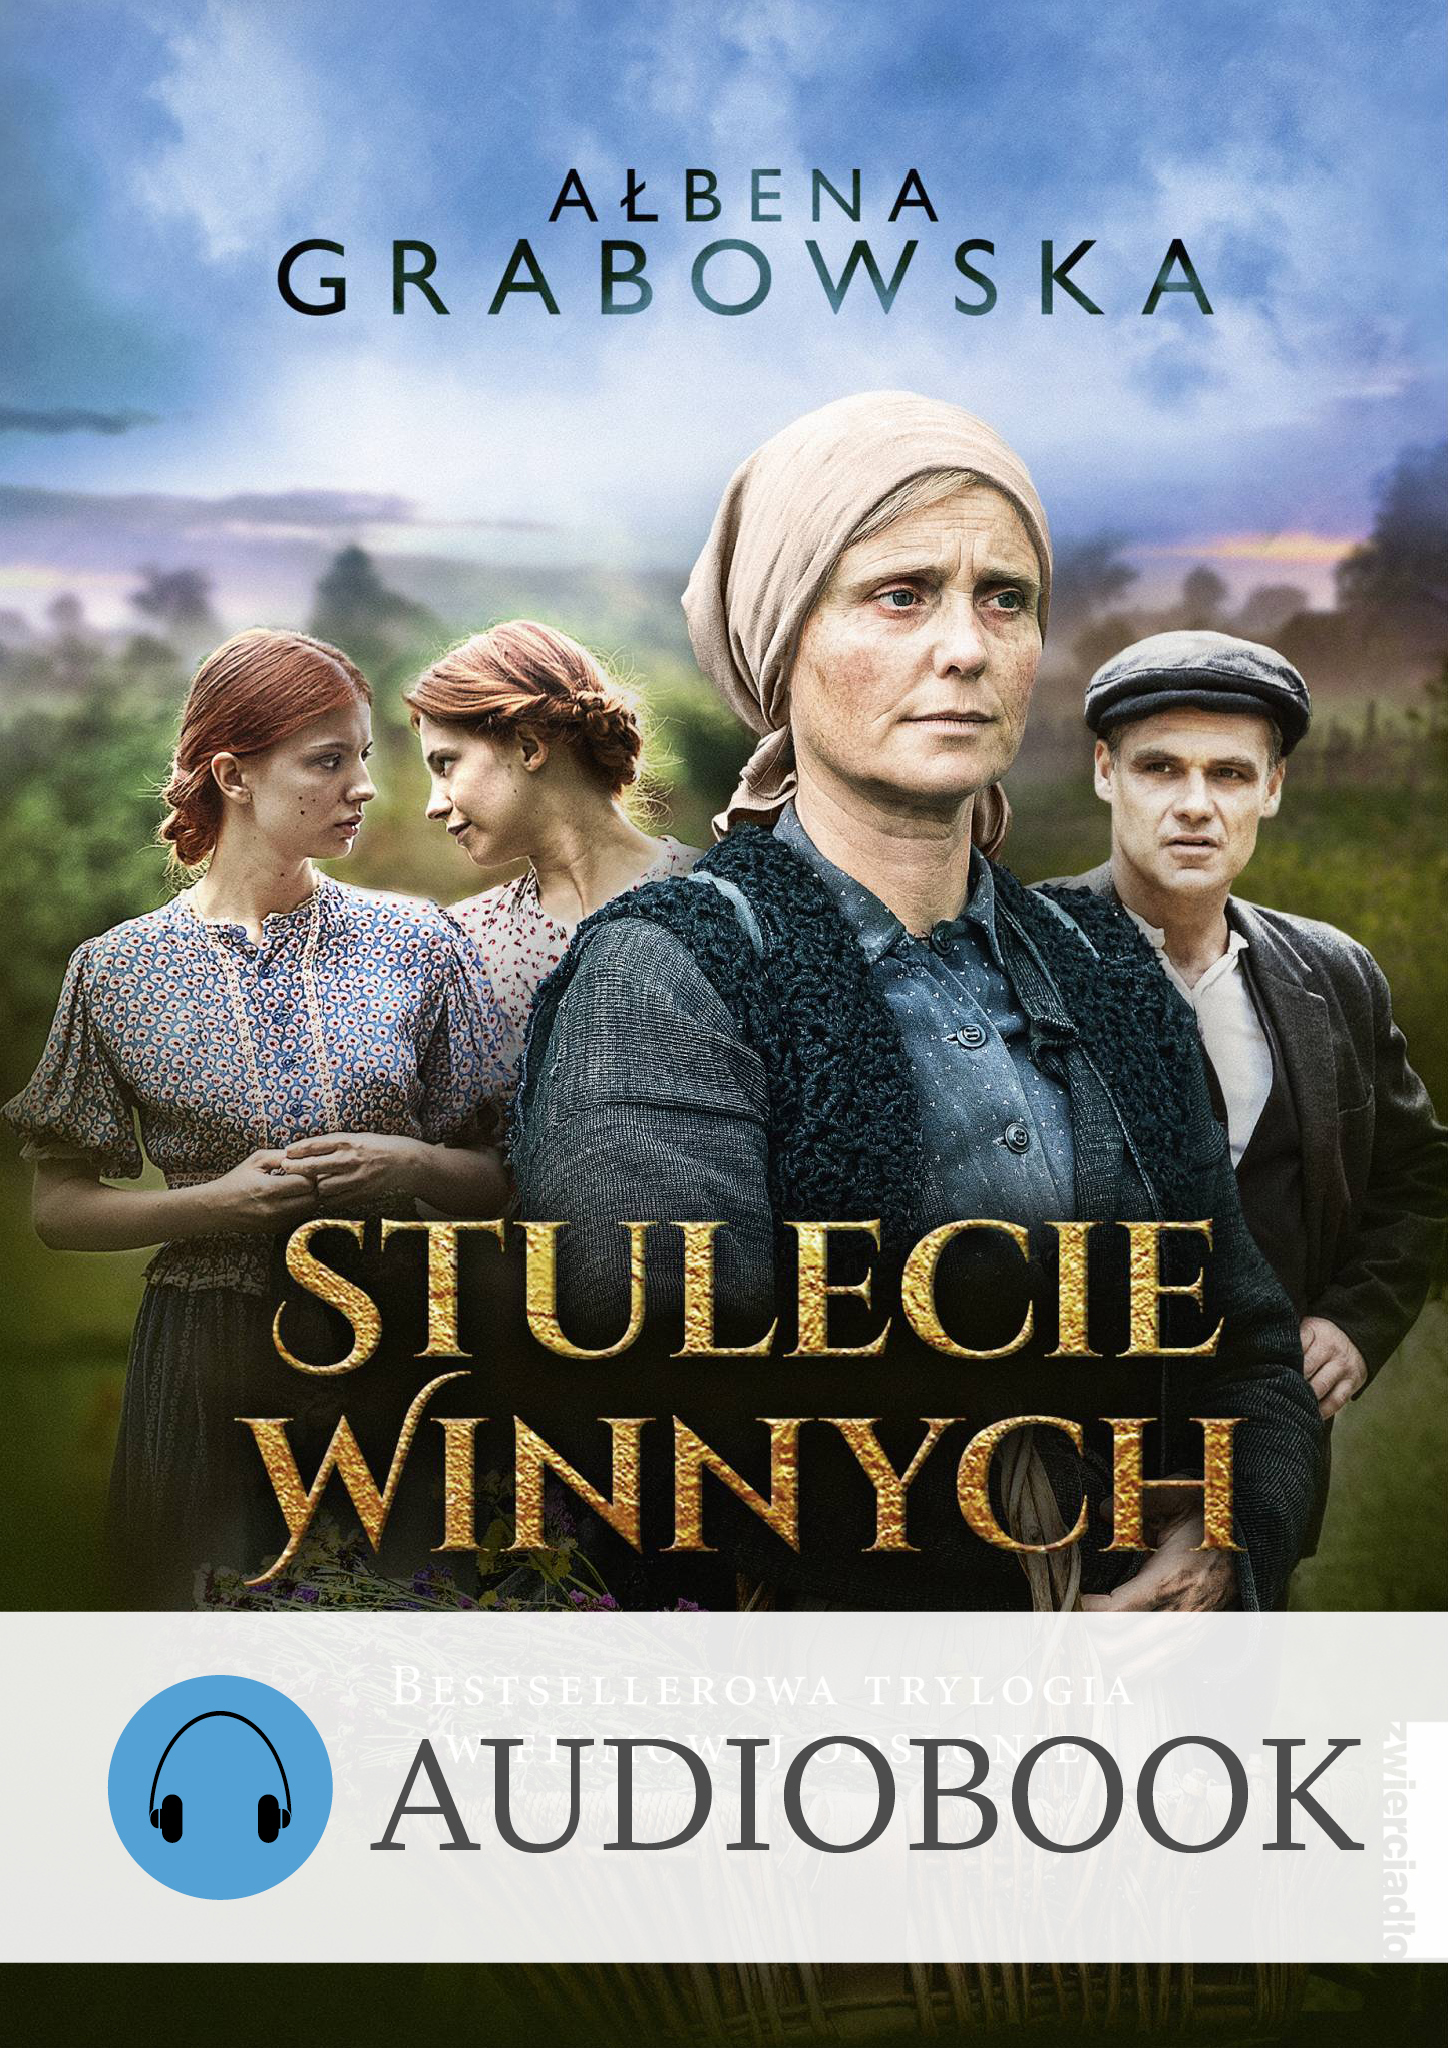 Stulecie Winnych [audiobook]